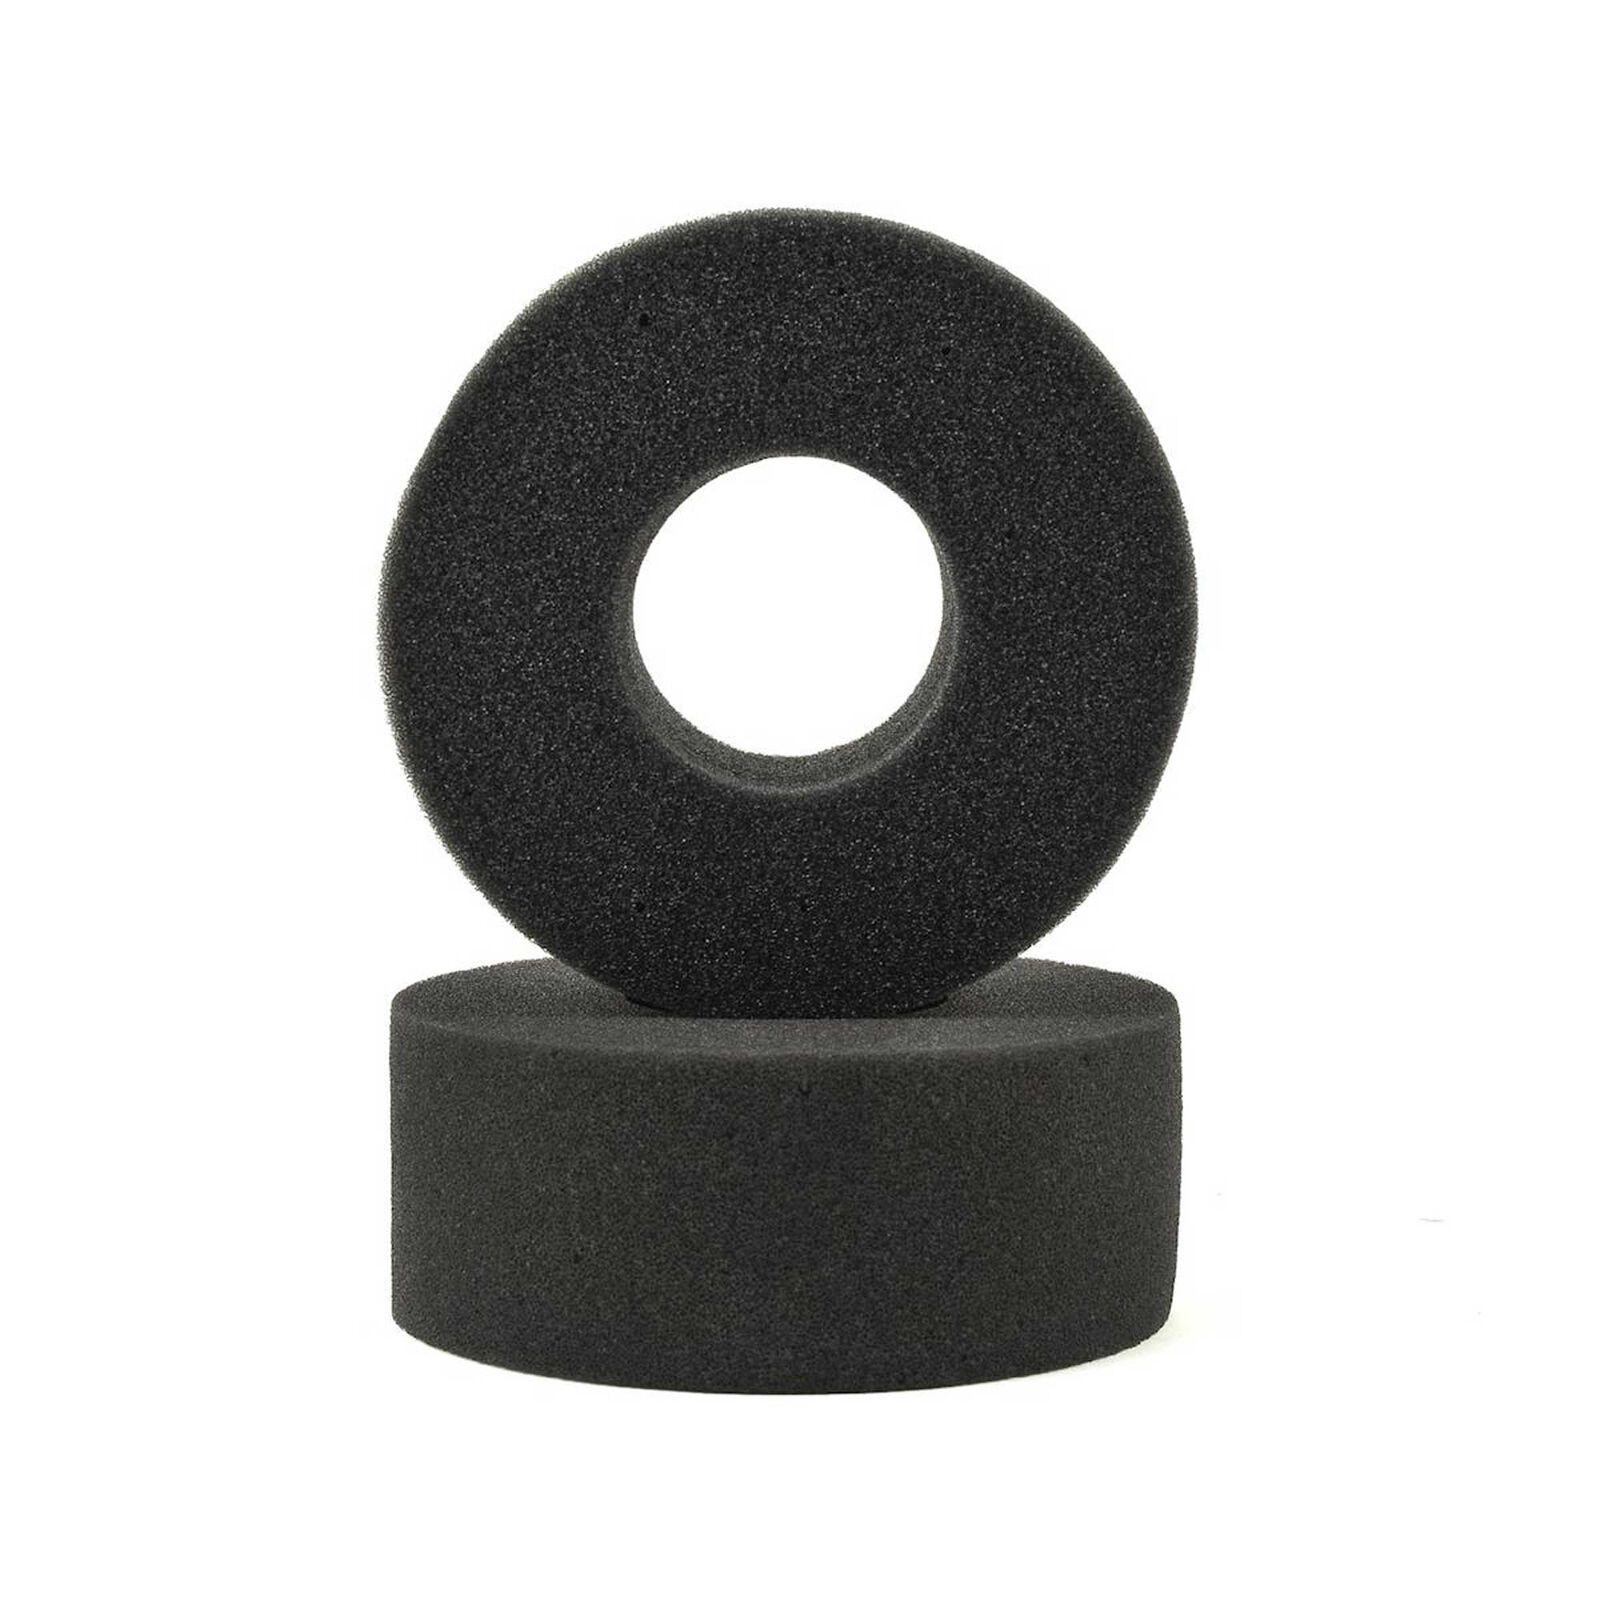 Dirty Richard Single Stage Foam Inserts Firm 115x47.6x37.4 (2)